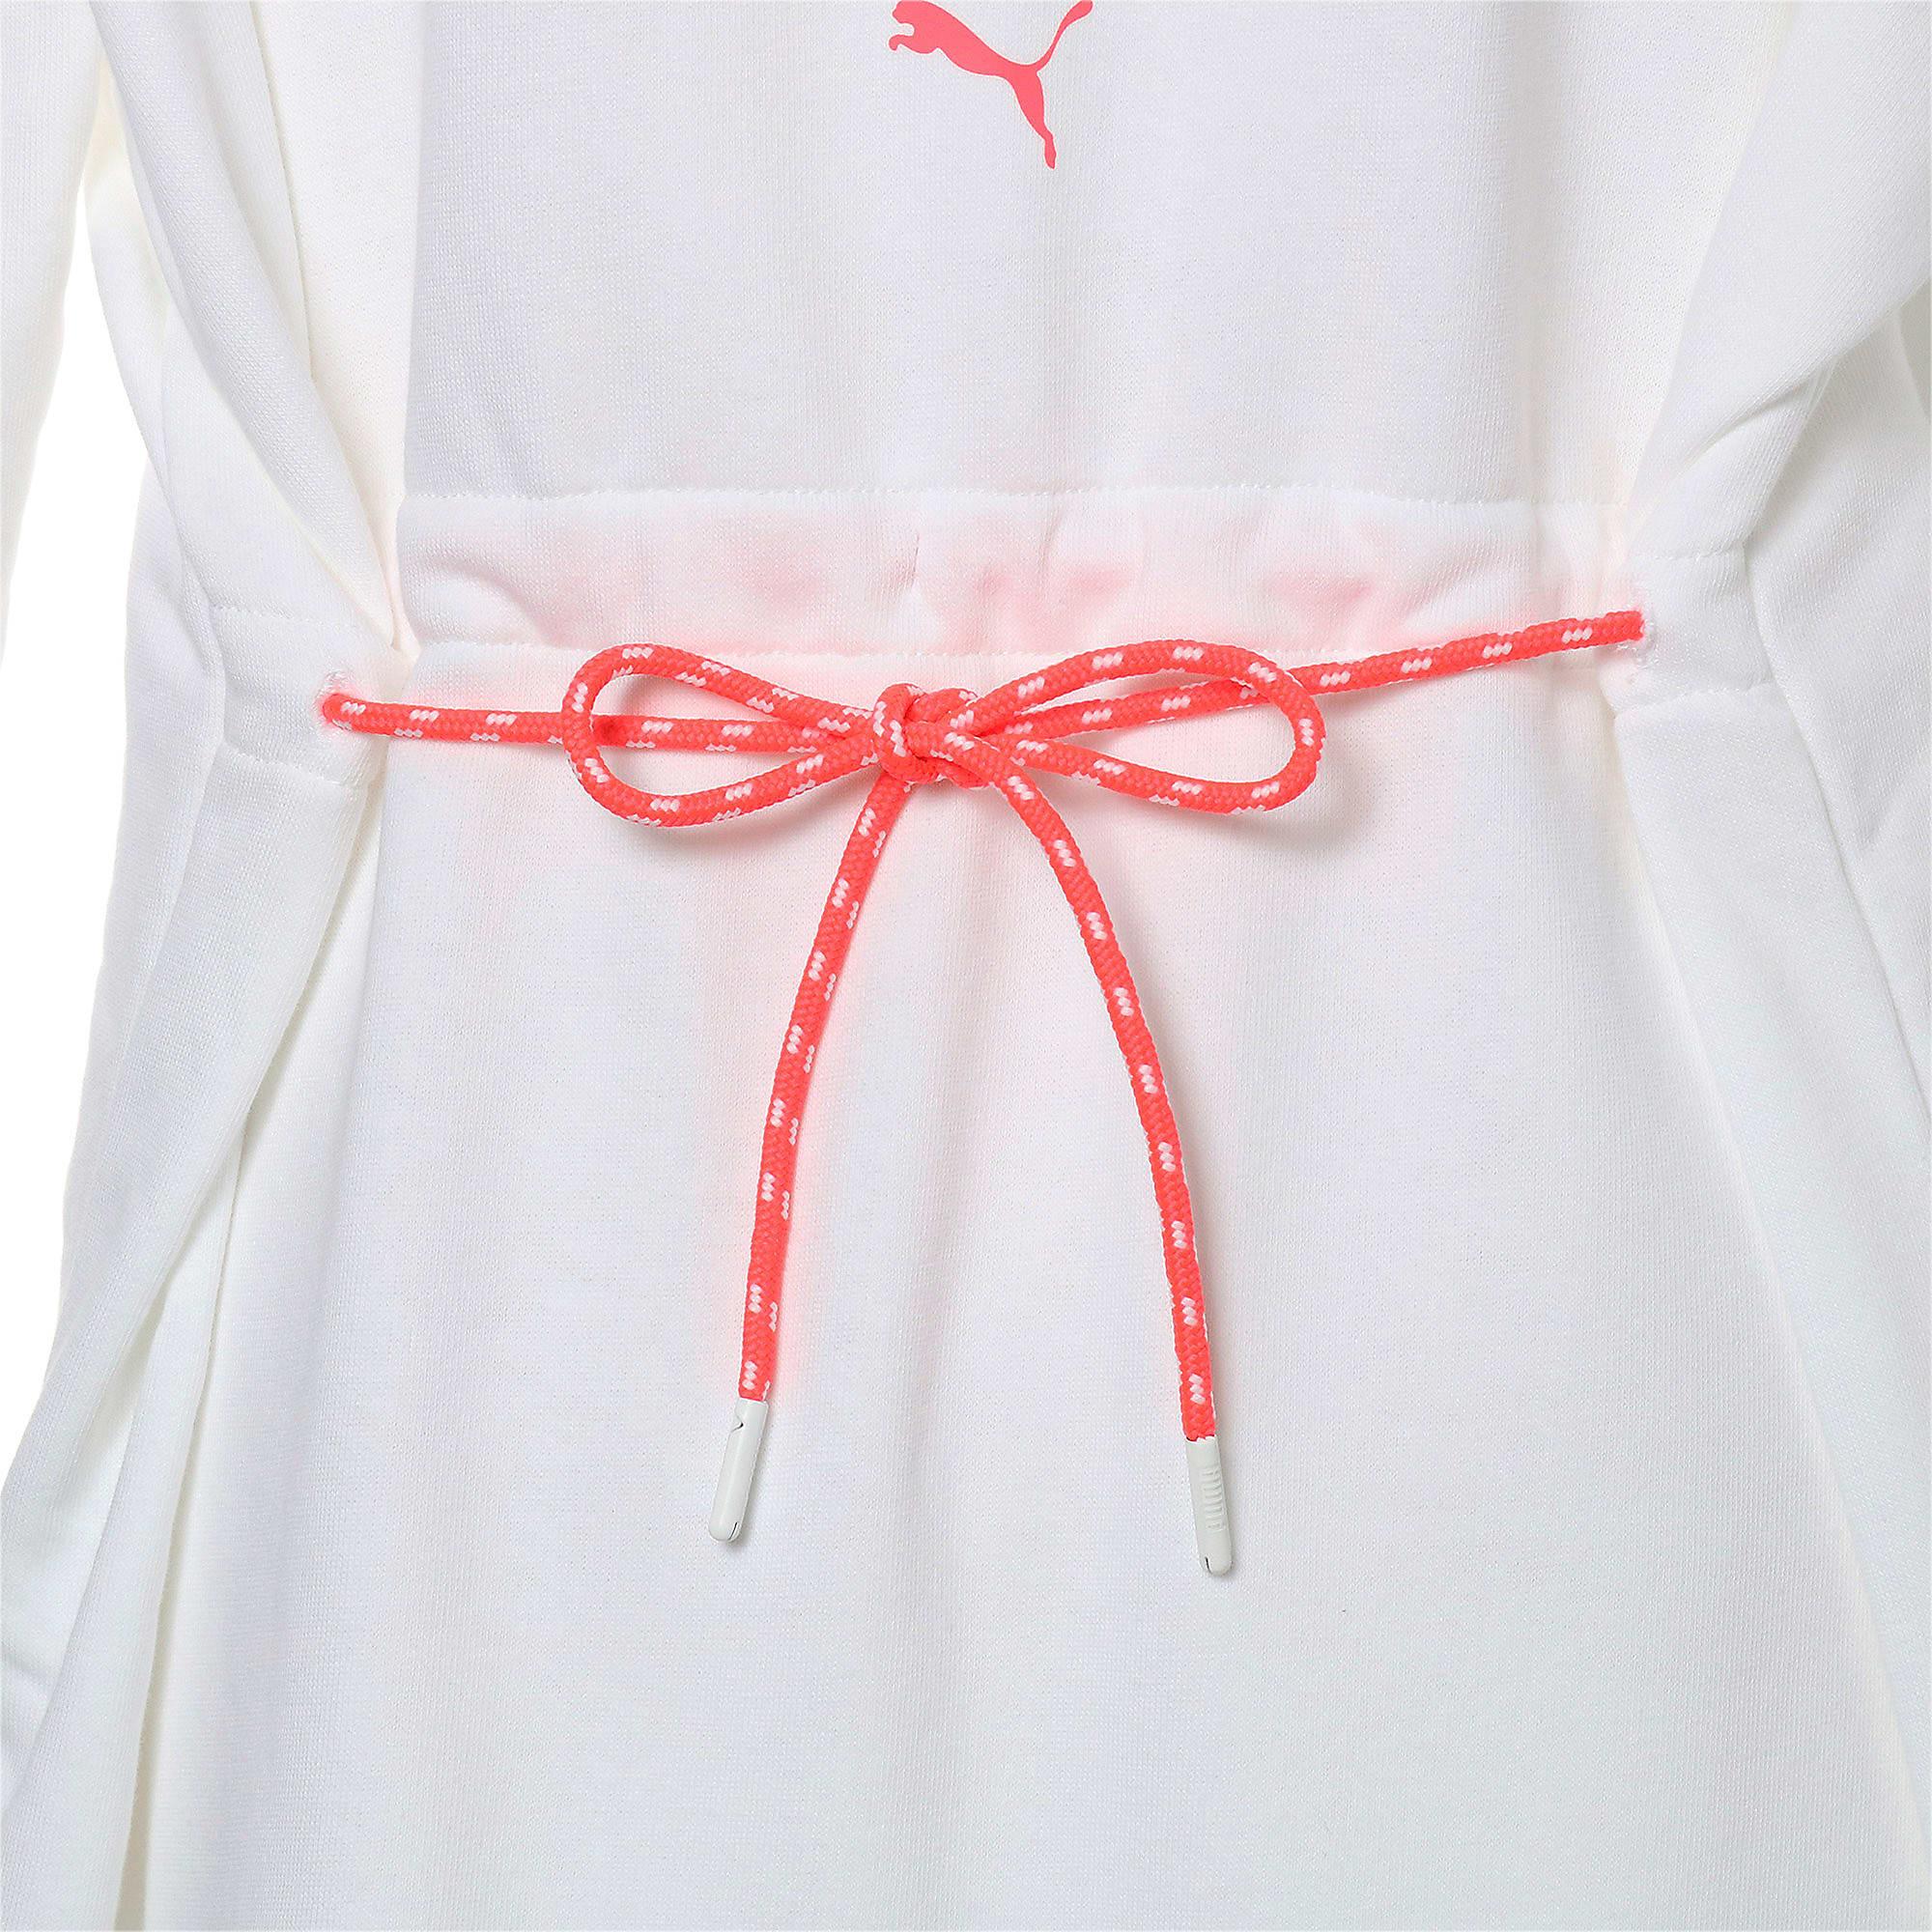 Thumbnail 11 of CHASE ウィメンズ フーデッドドレス, Puma White, medium-JPN